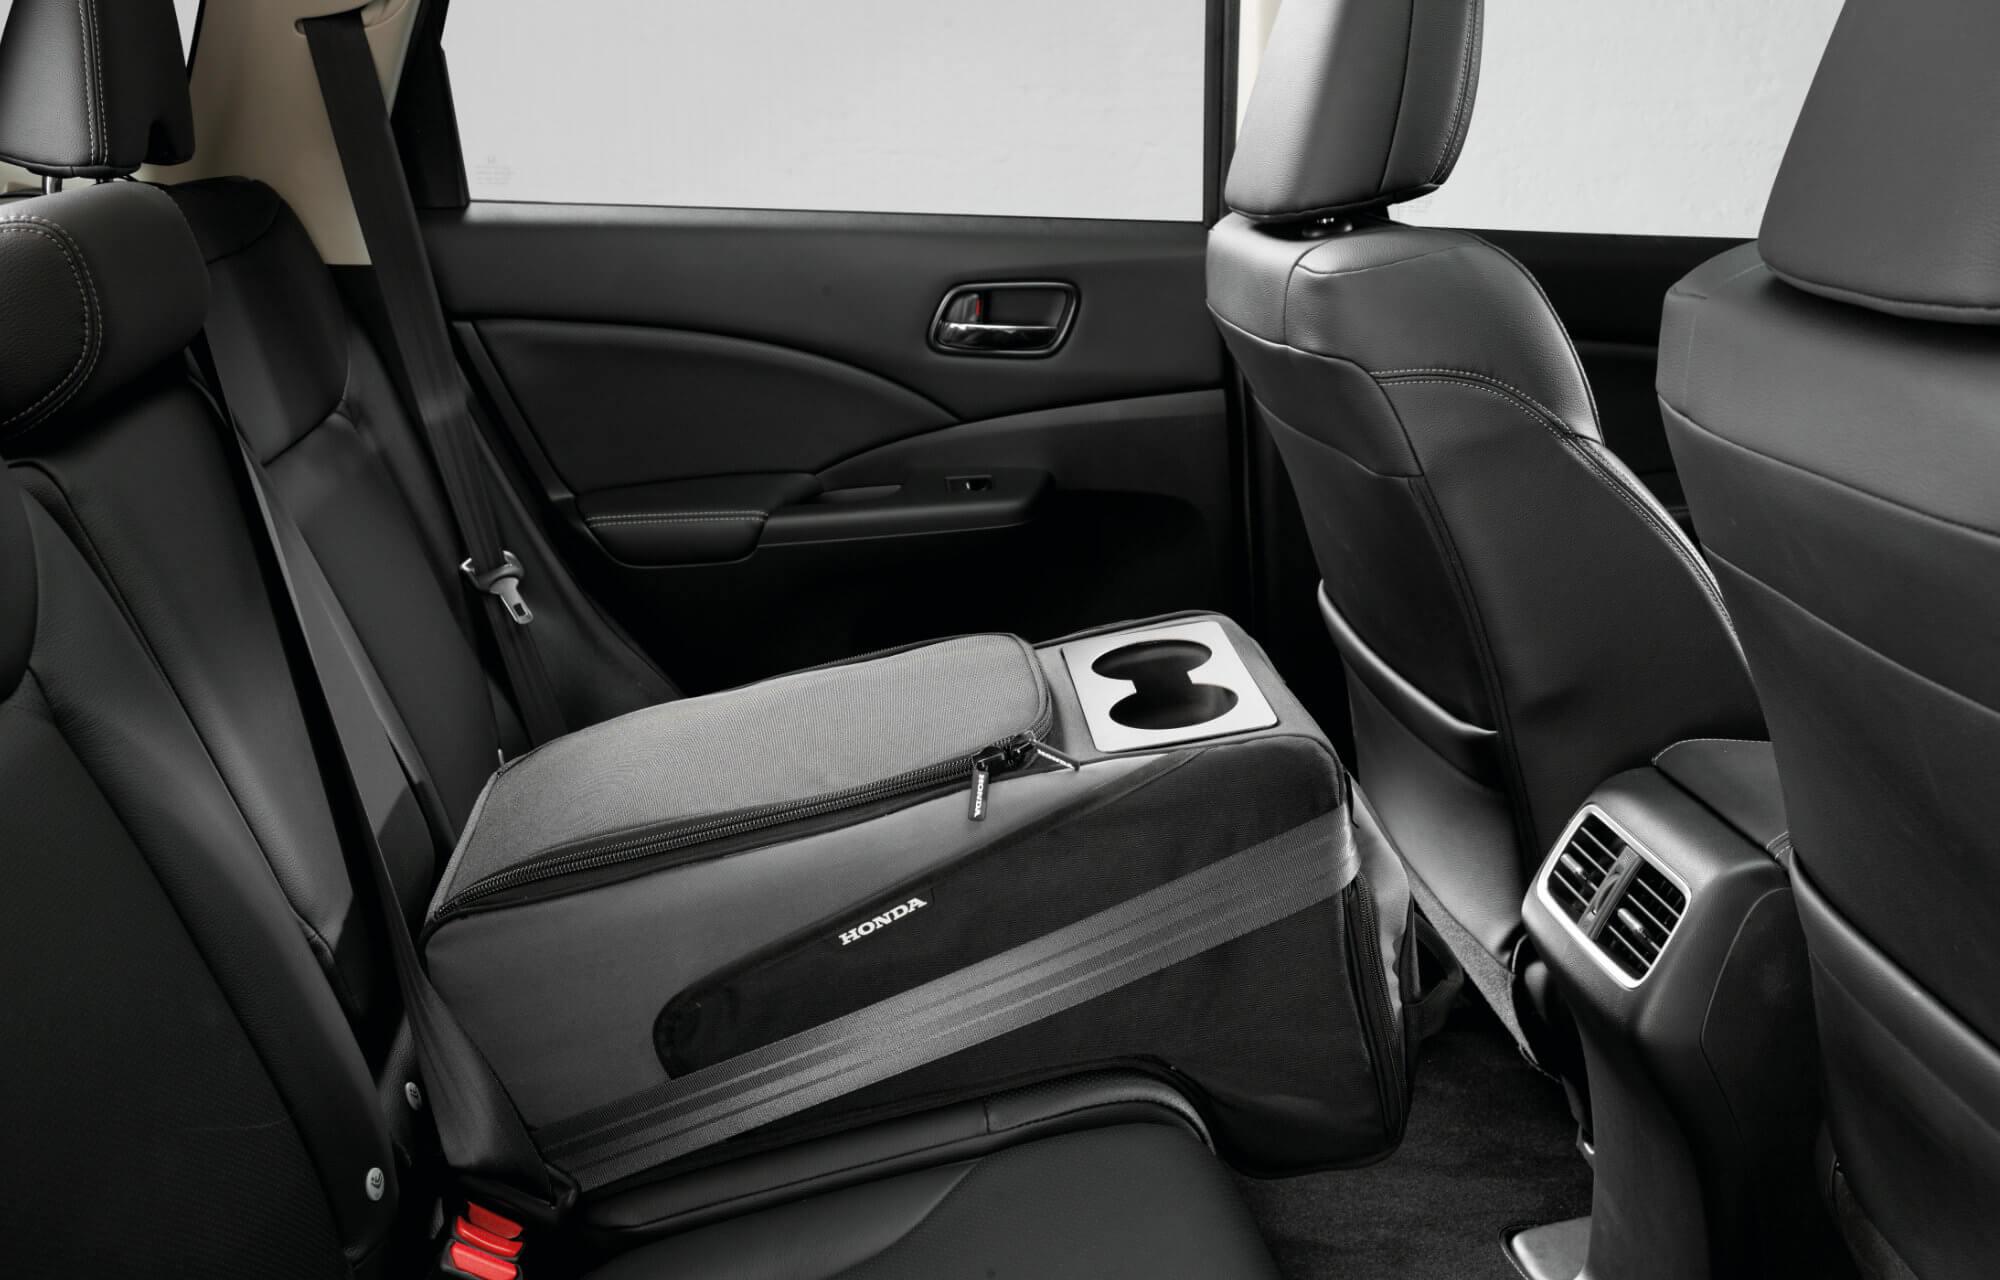 Honda Armrest Bag